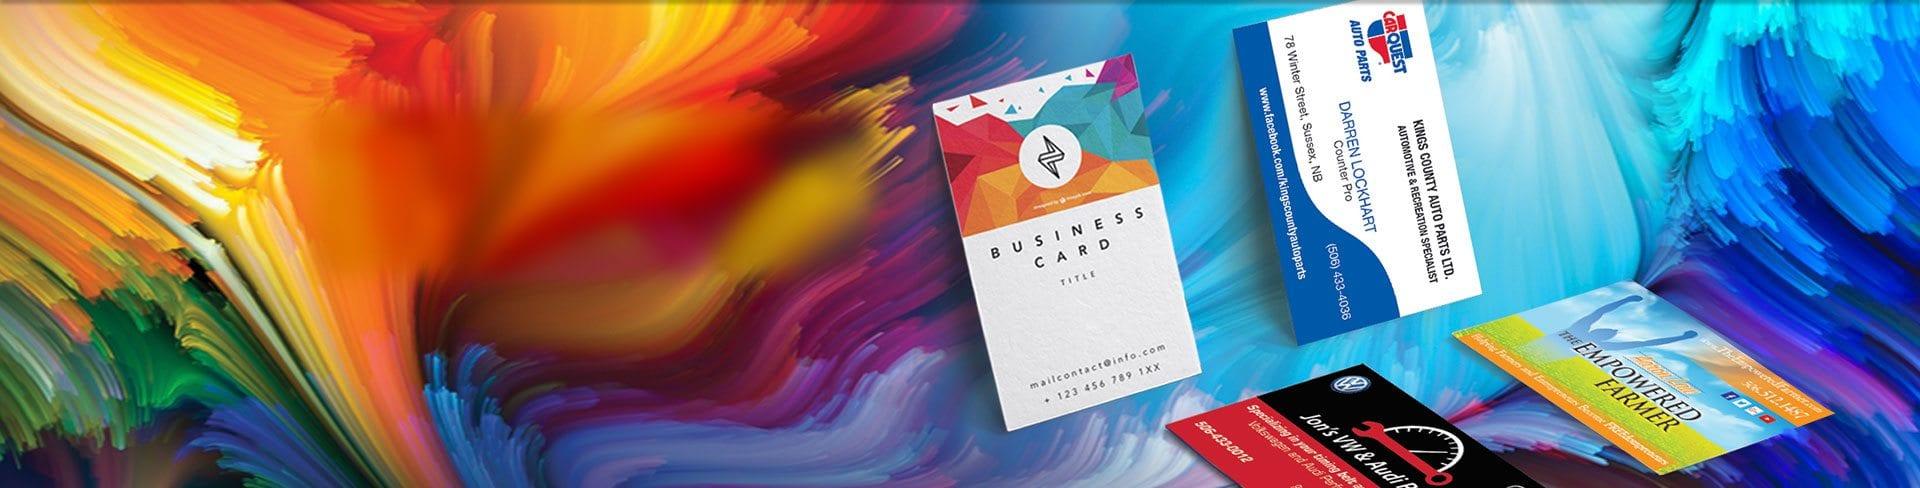 business-card-printing-services | Rainbow Printing